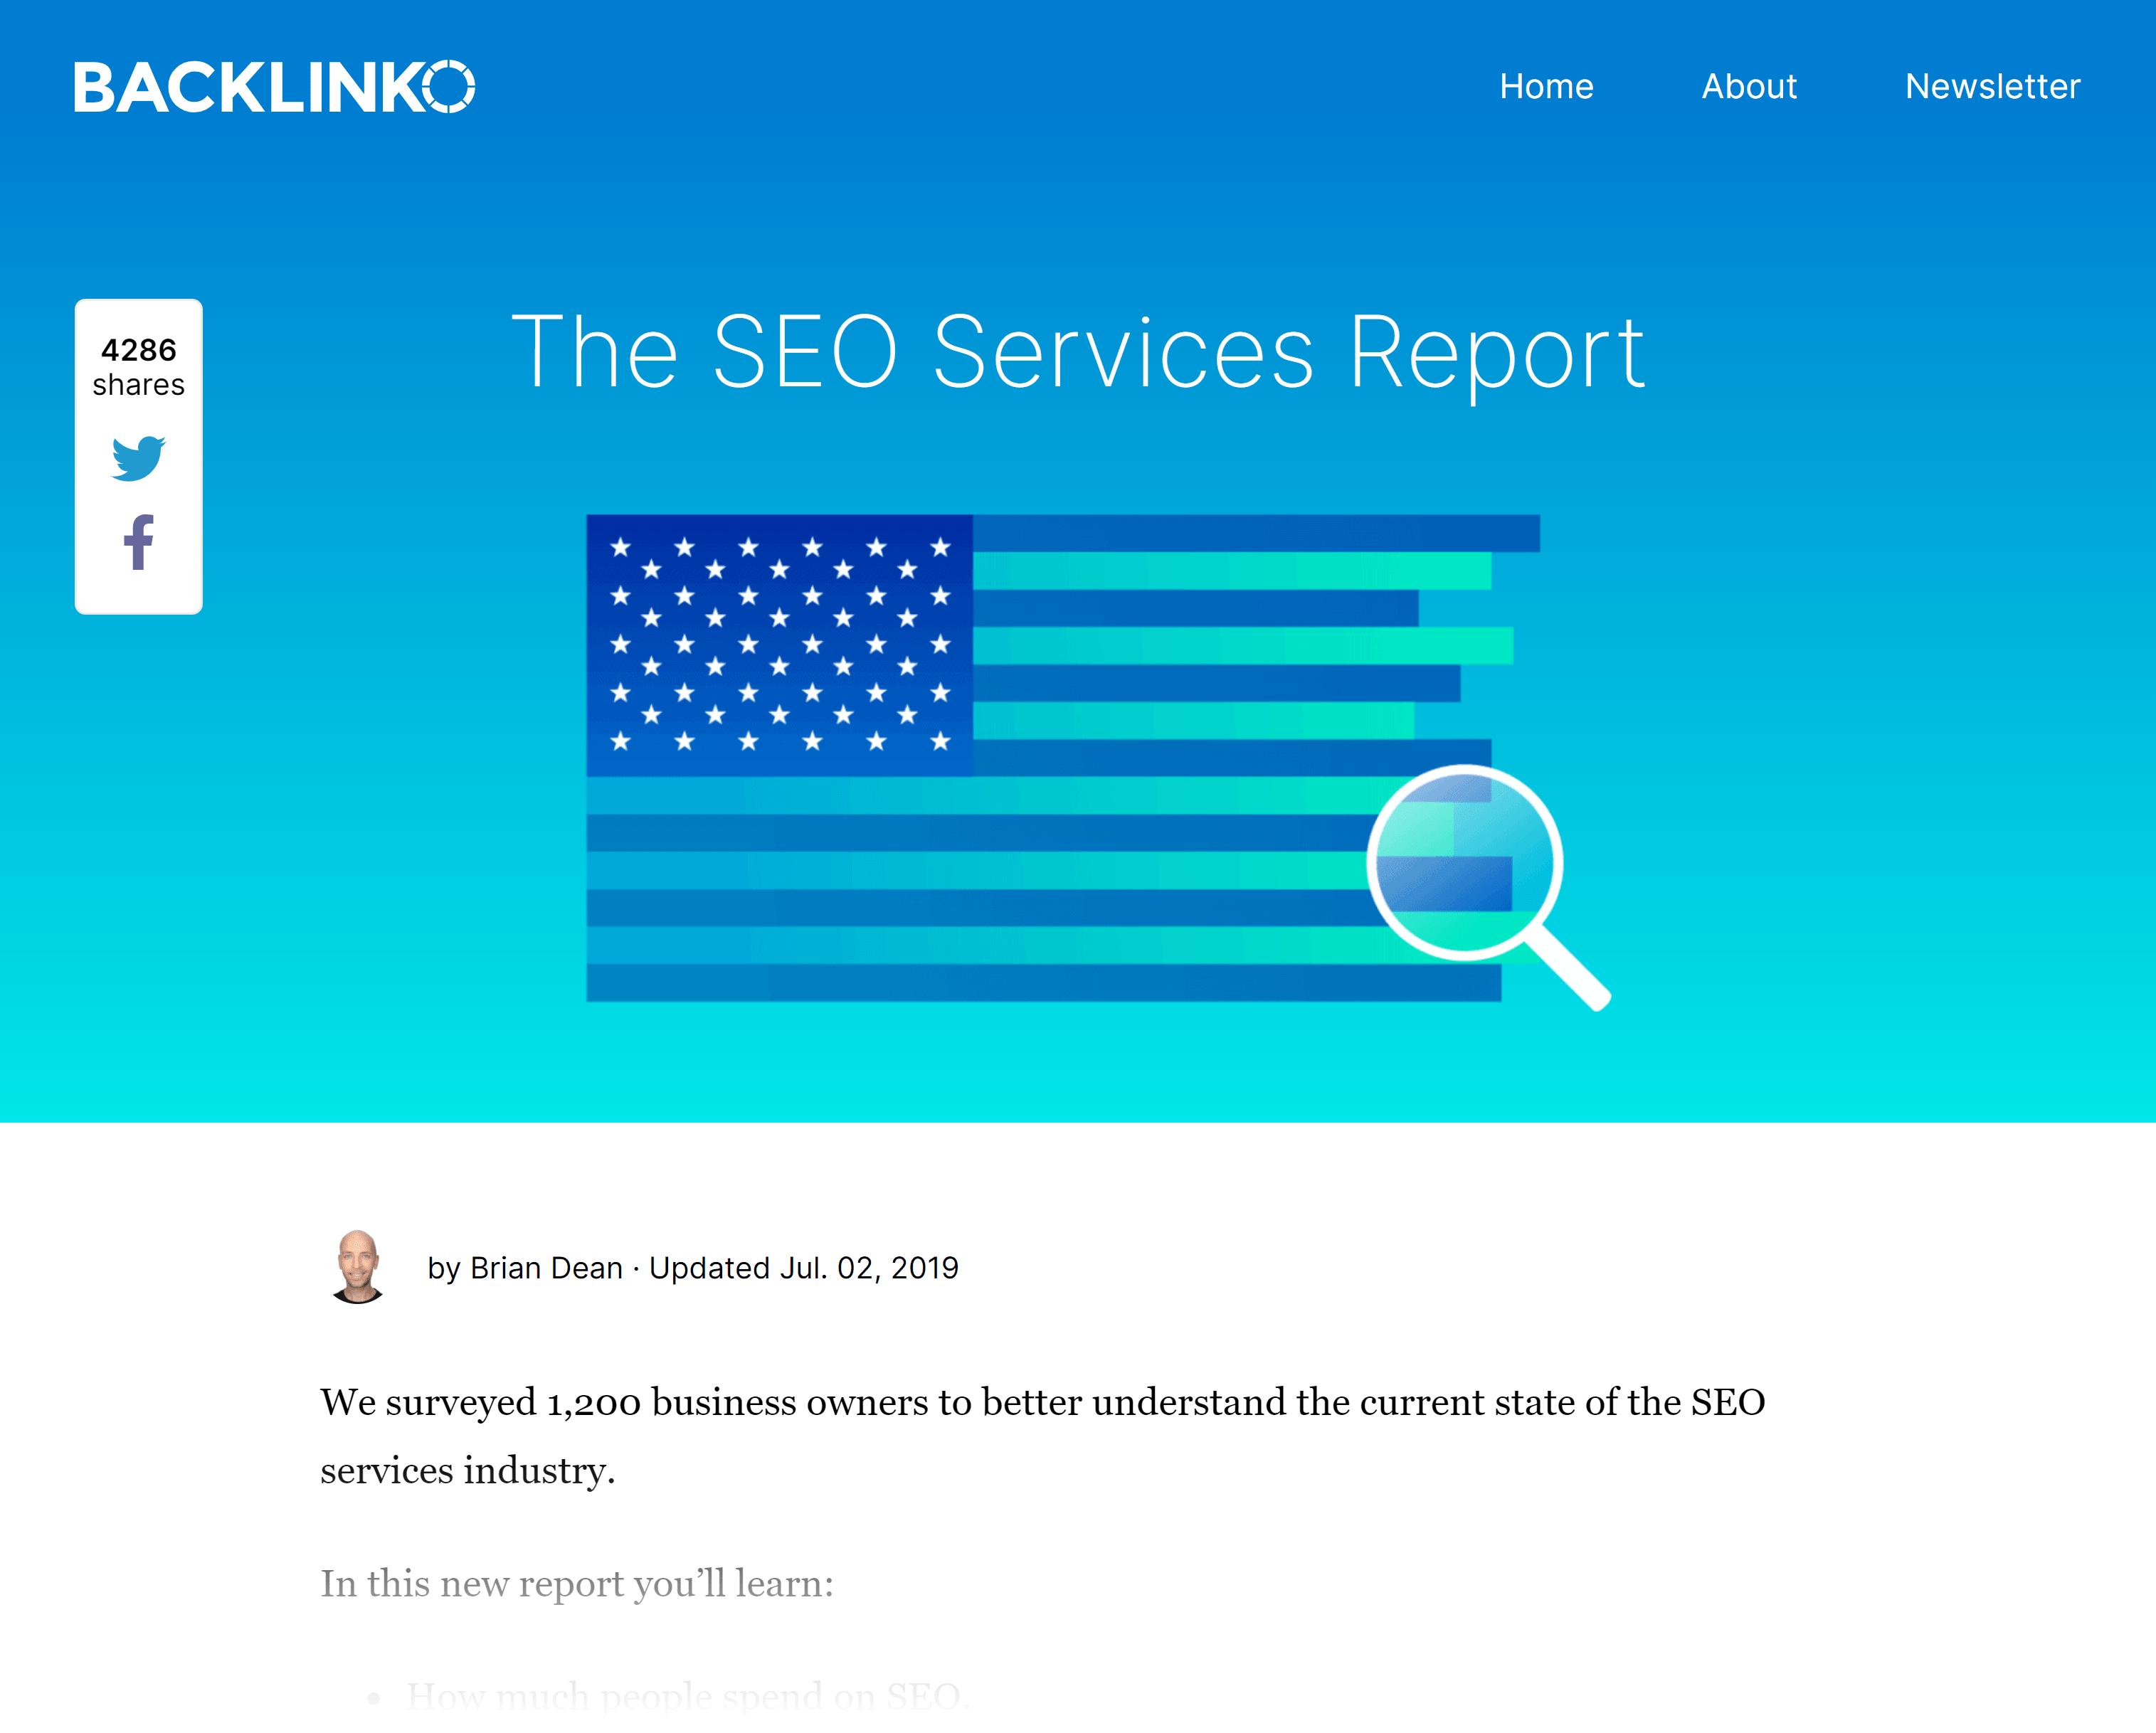 Backlinko – SEO services statistics